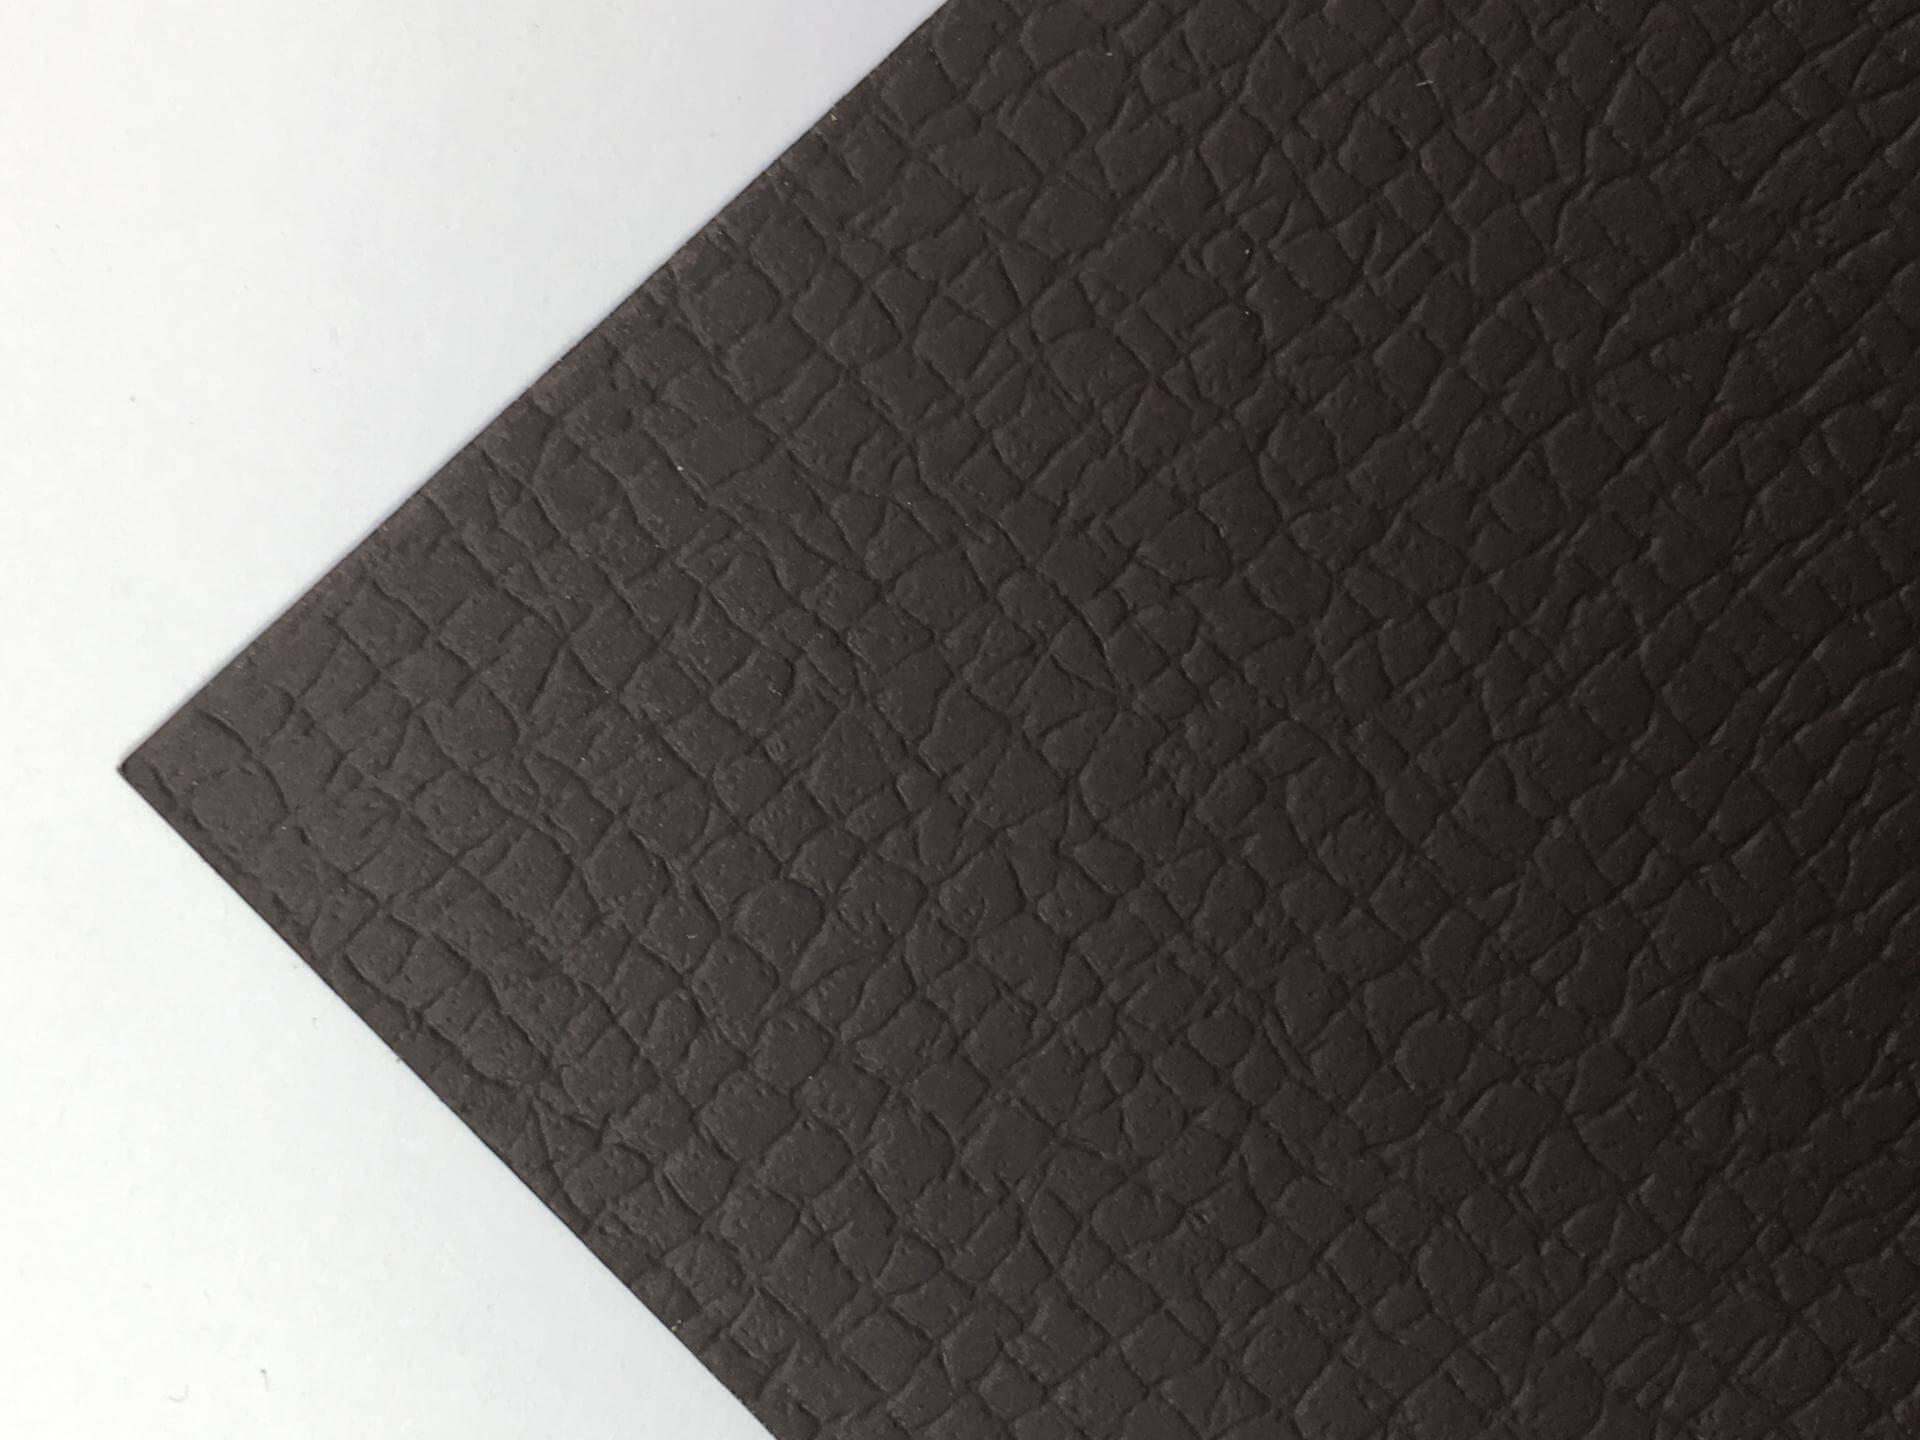 LeatherLike brown vintage